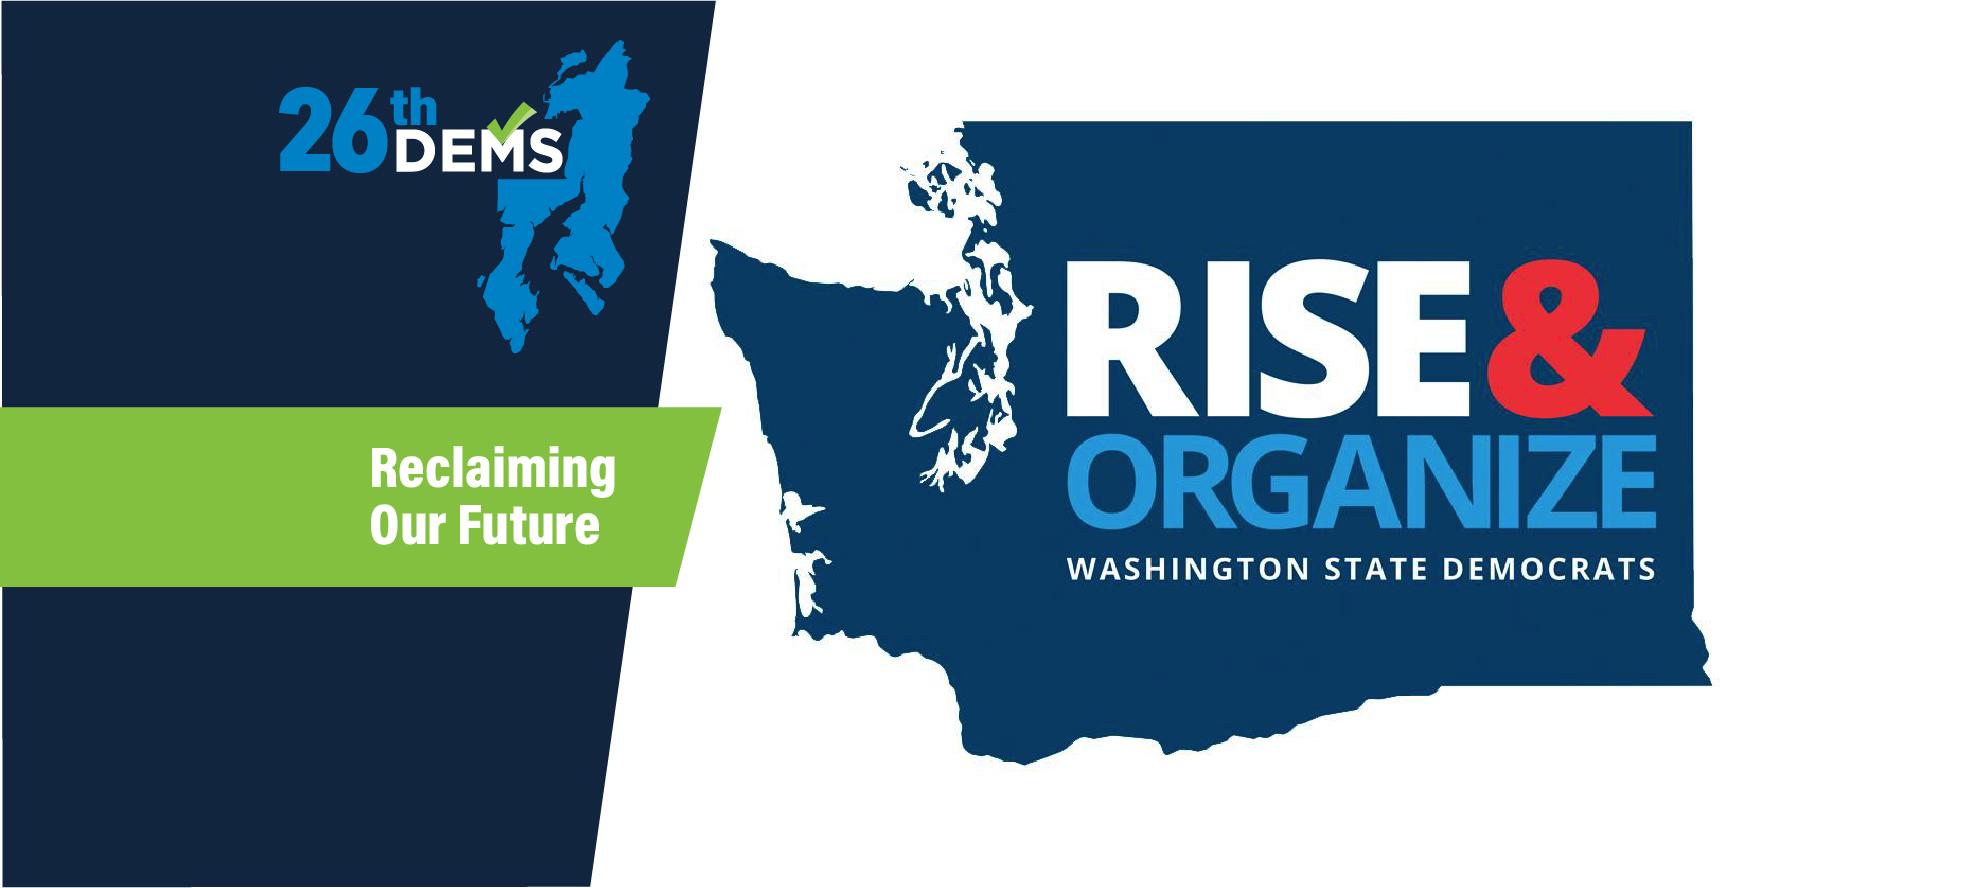 26th LD Rise & Organize